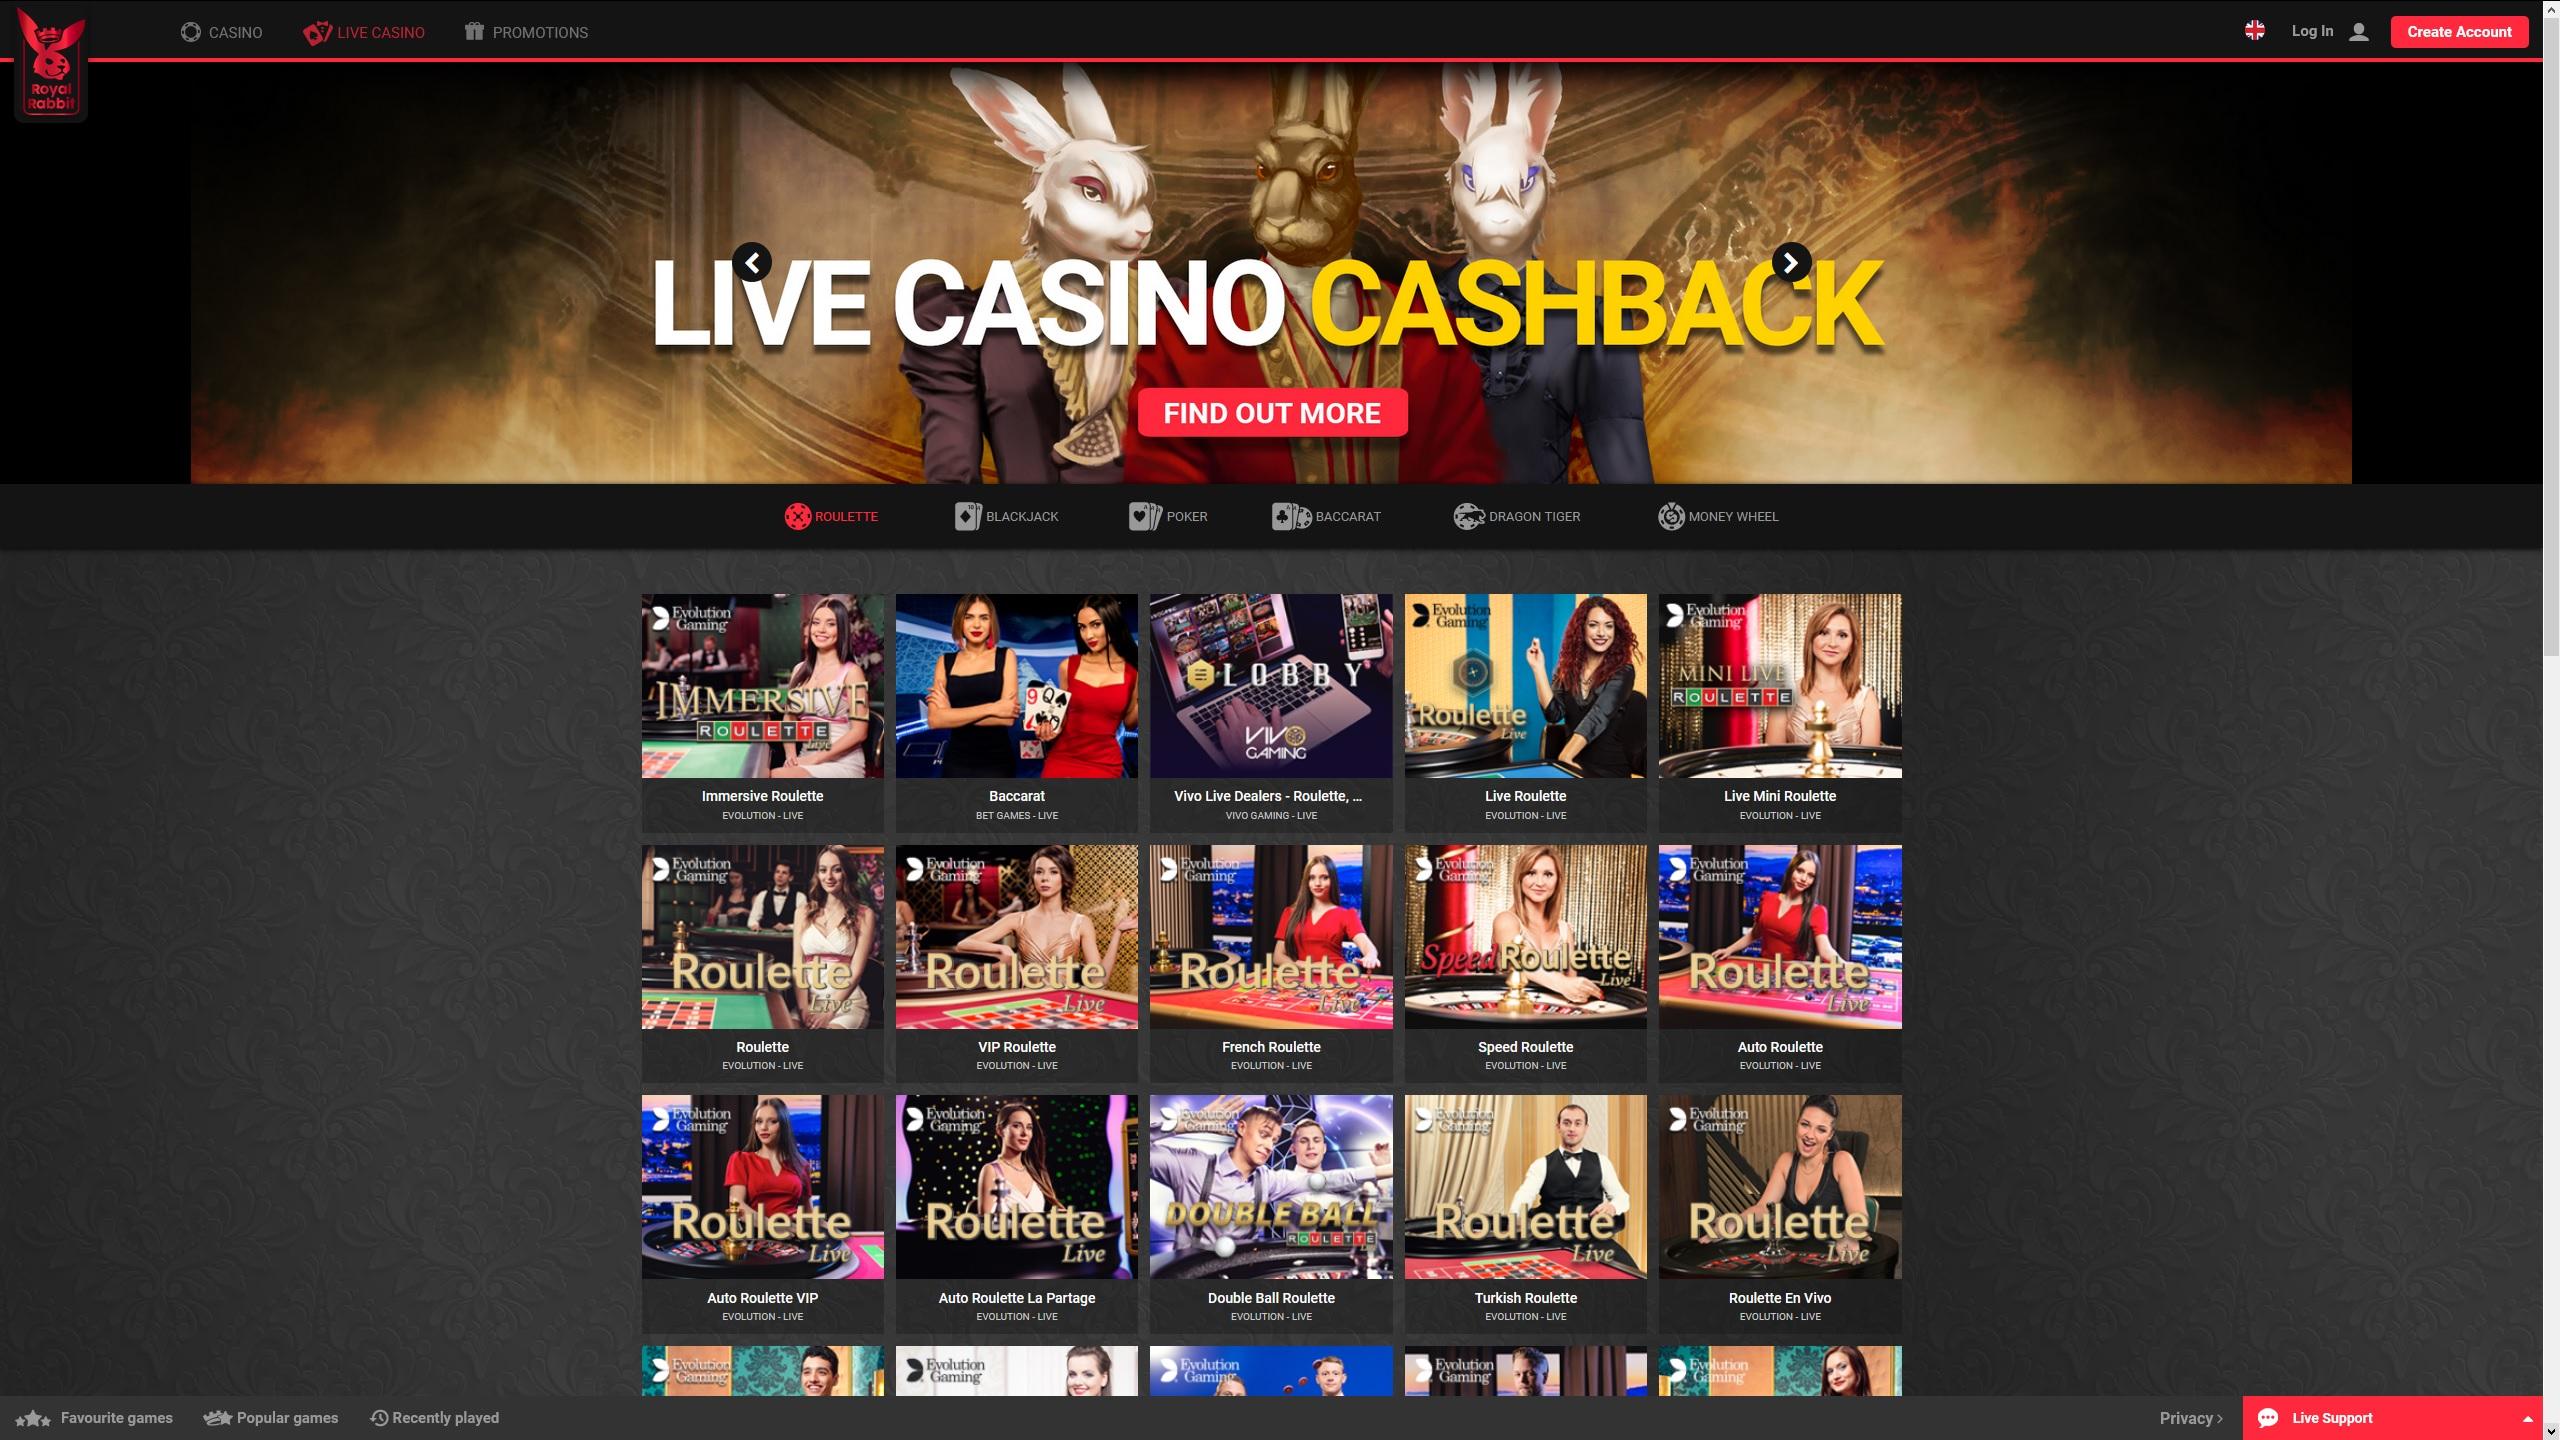 Royal Rabbit Casino Offers Live Casino